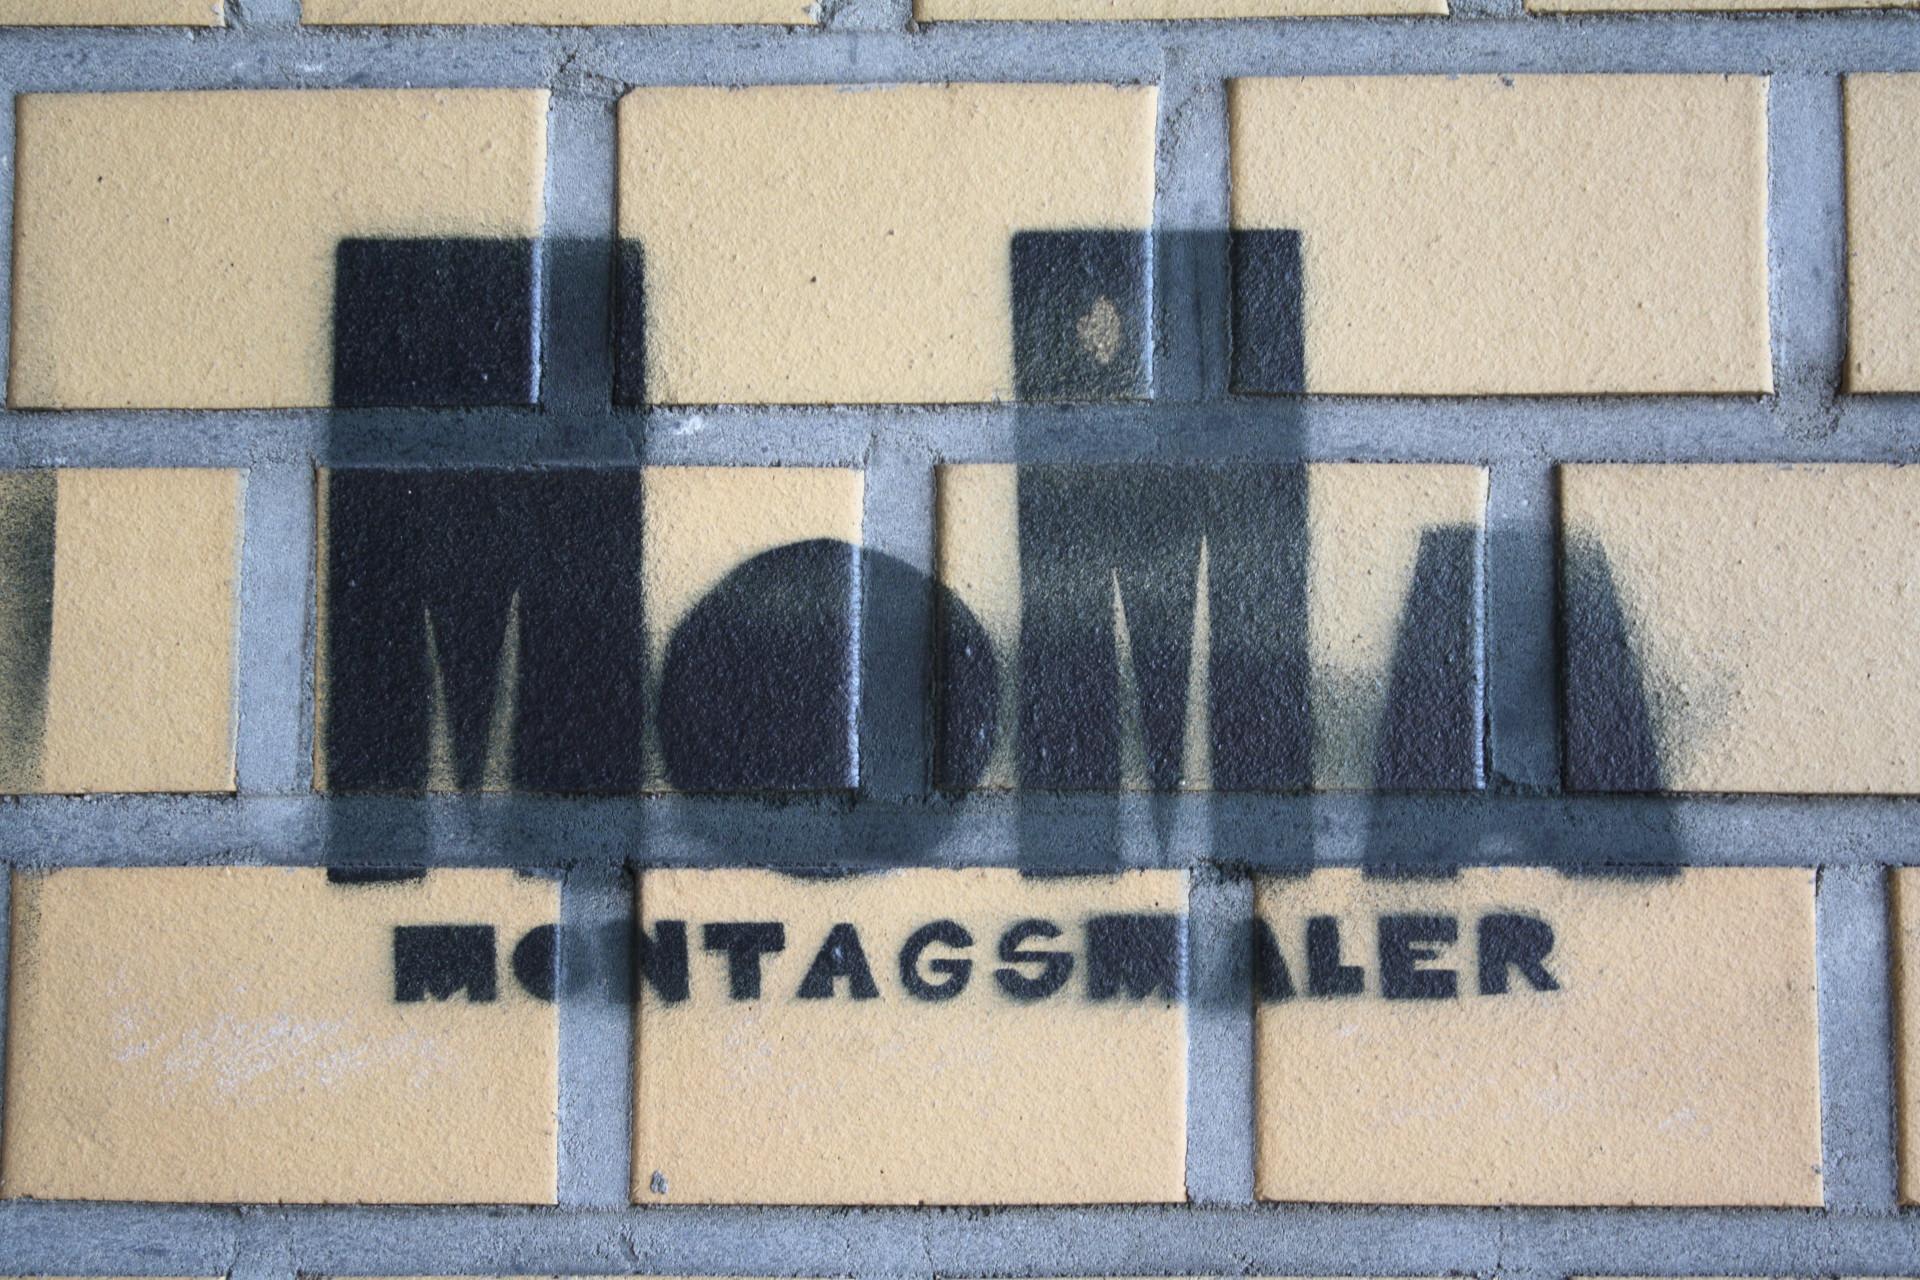 MOMA, UnterfBahnhof_MG_5820